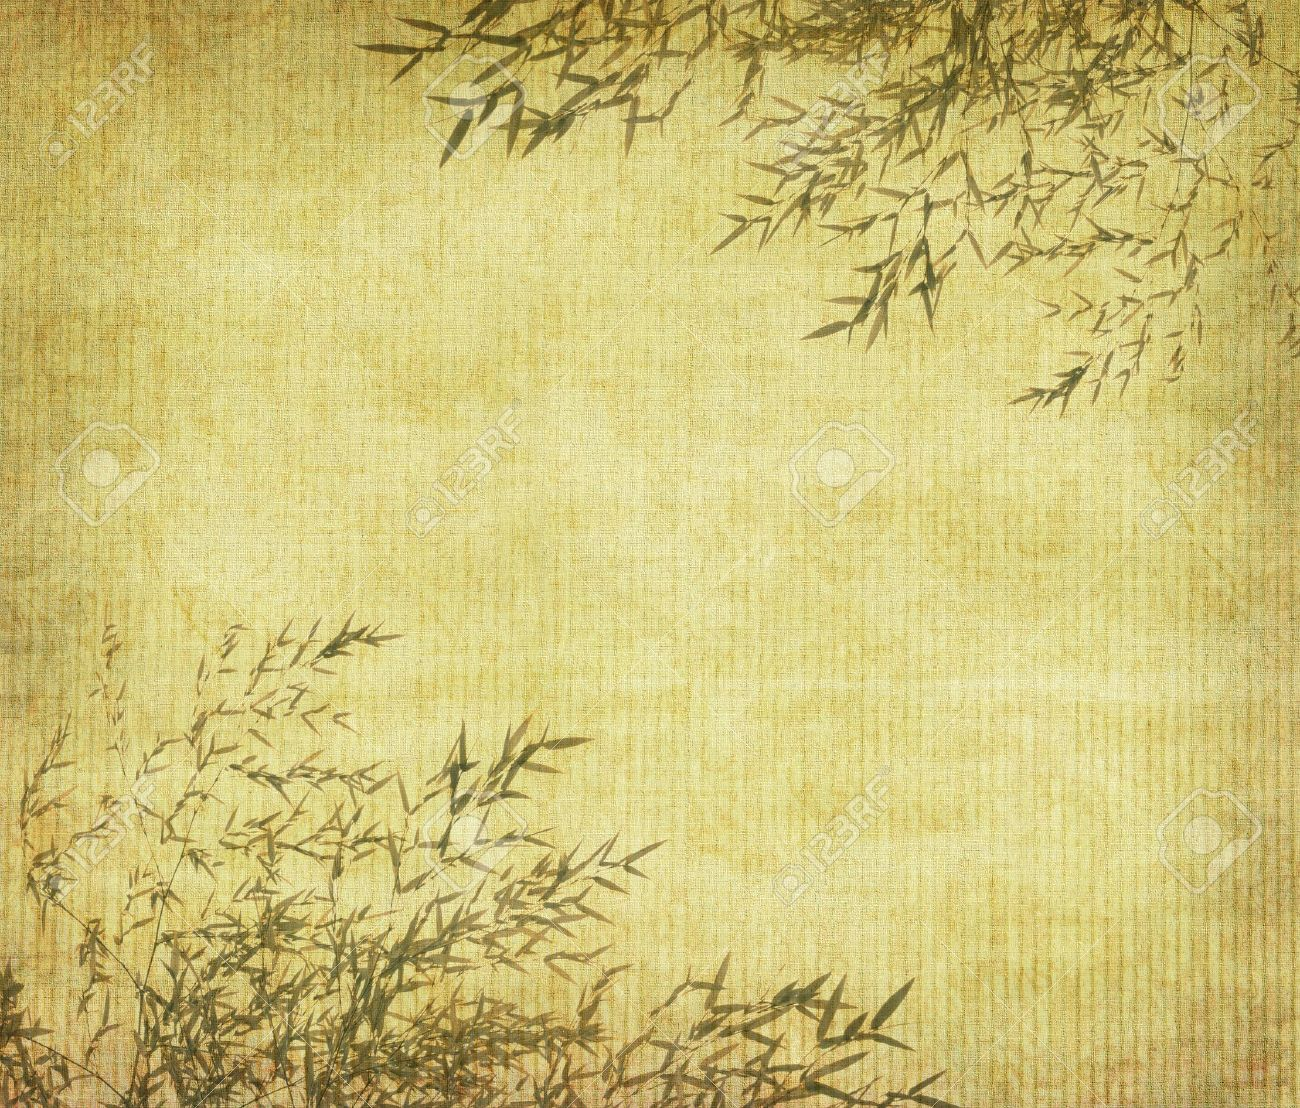 Old antique vintage paper background Stock Photo - 9471459